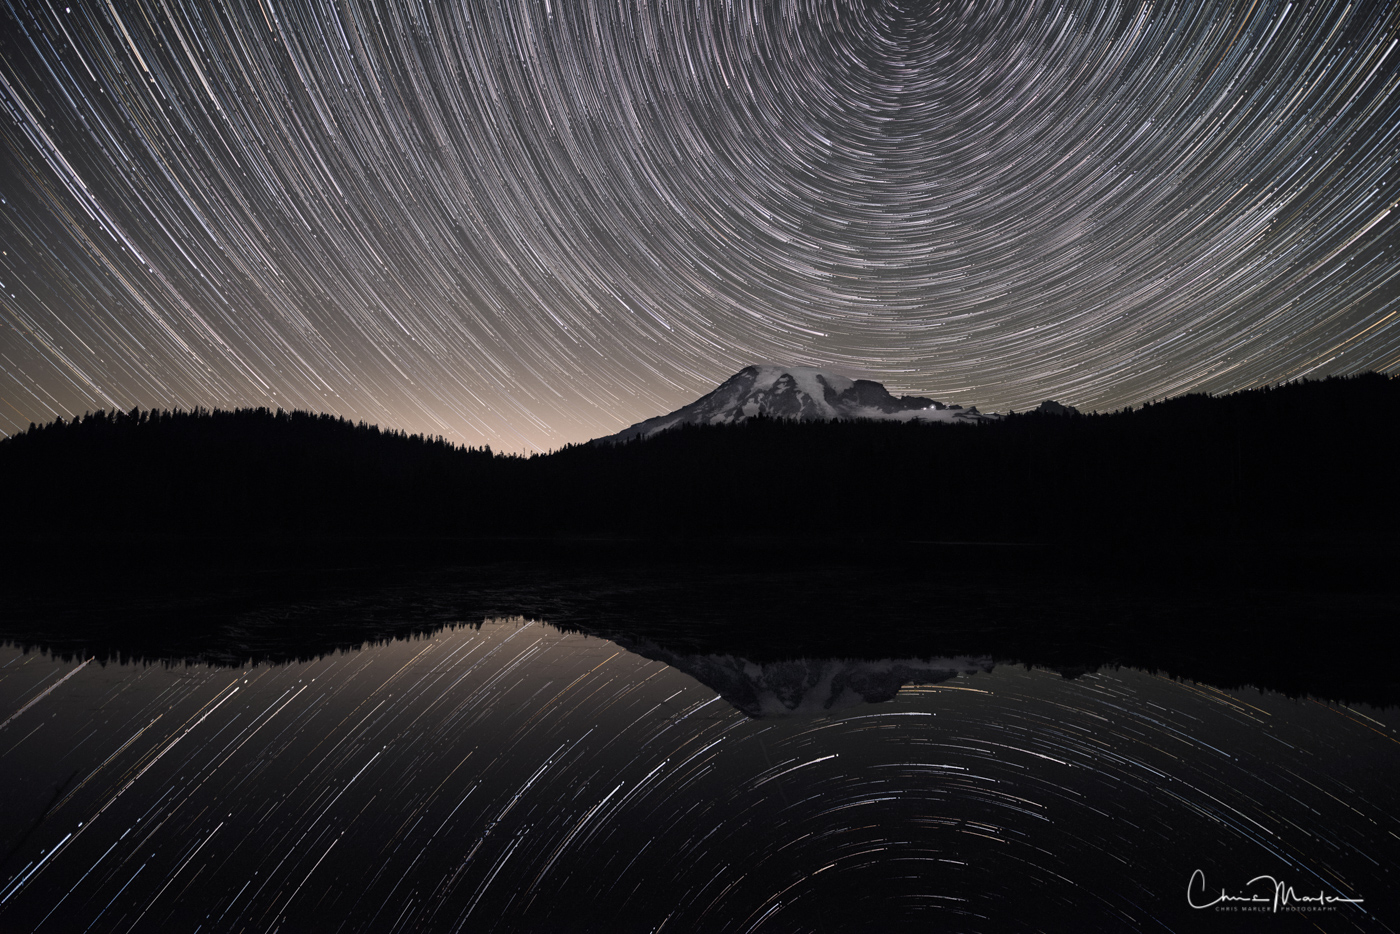 Mt. Rainier, Washington, mountain, star trails, Reflection Lake, astrophotography, north star, reflection, night, sky, photo